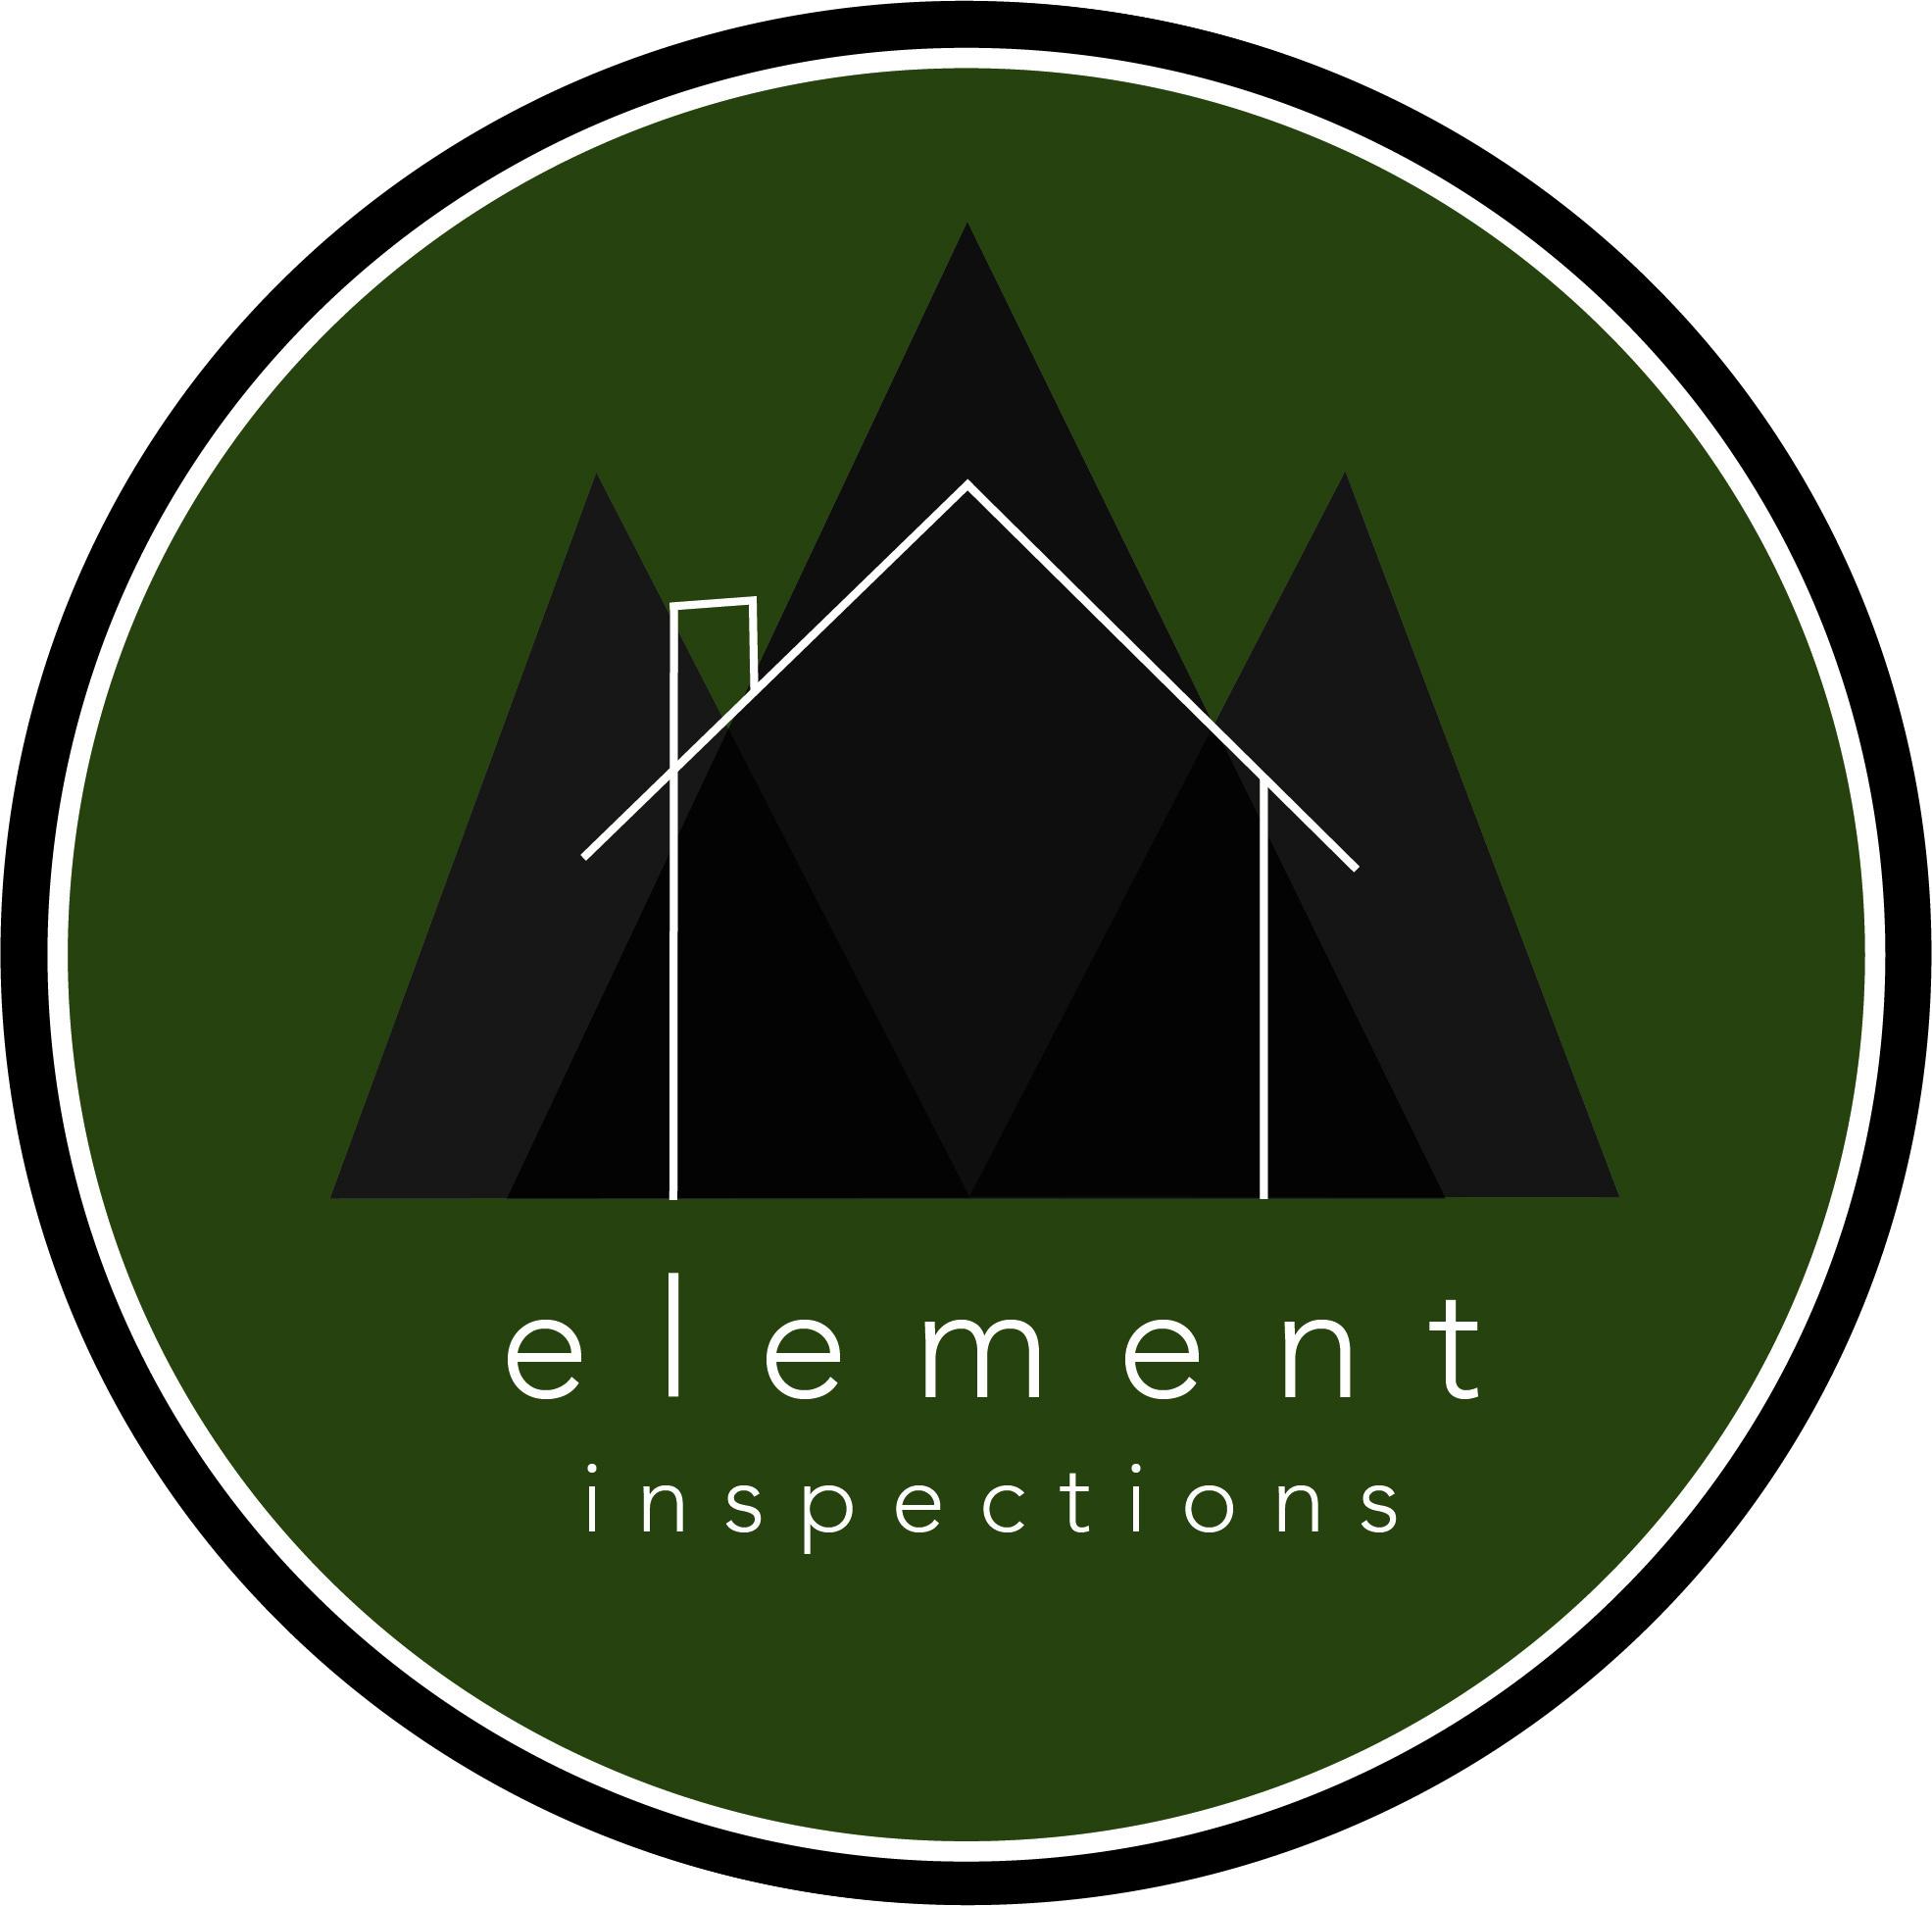 Element inspections